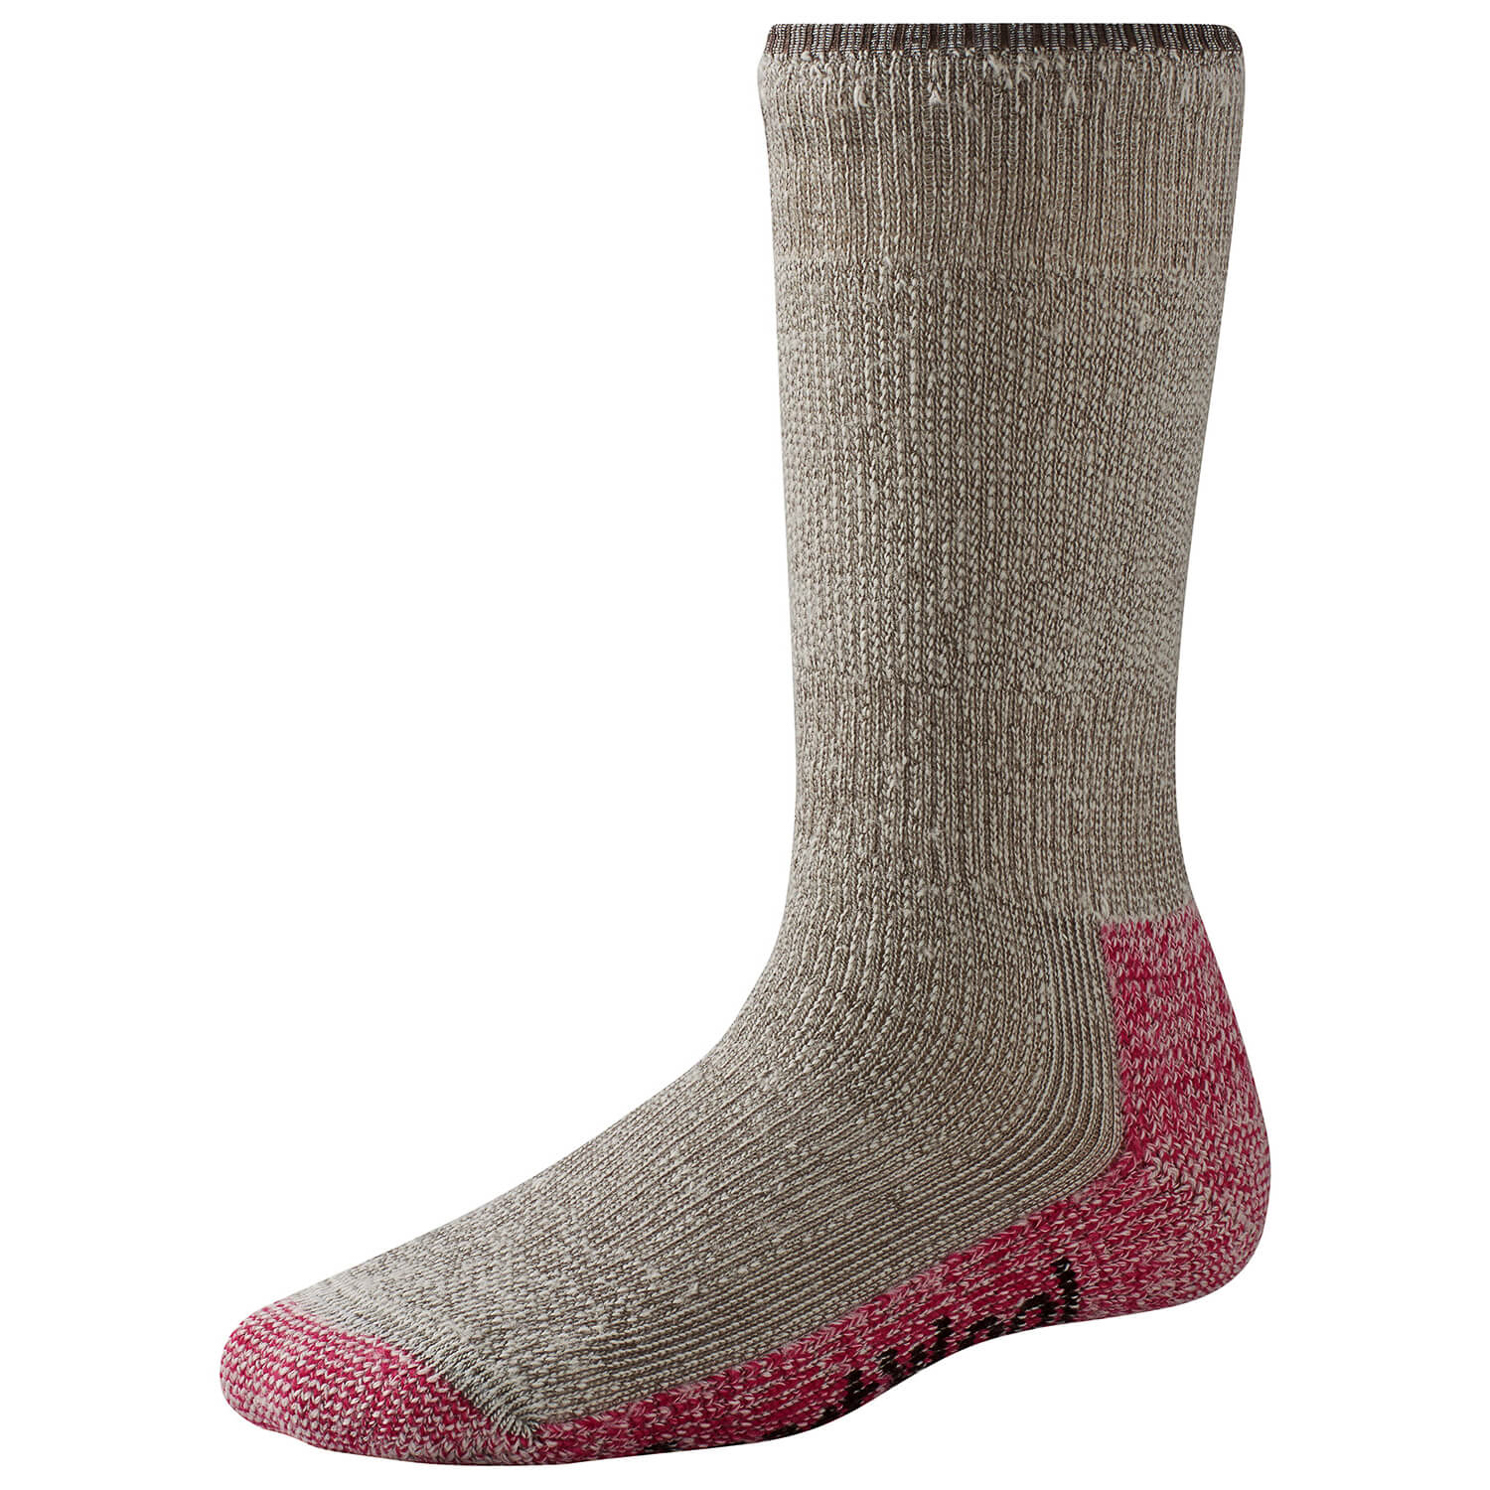 New Smartwool Women's Mountaineering Extra Heavy Crew Socks